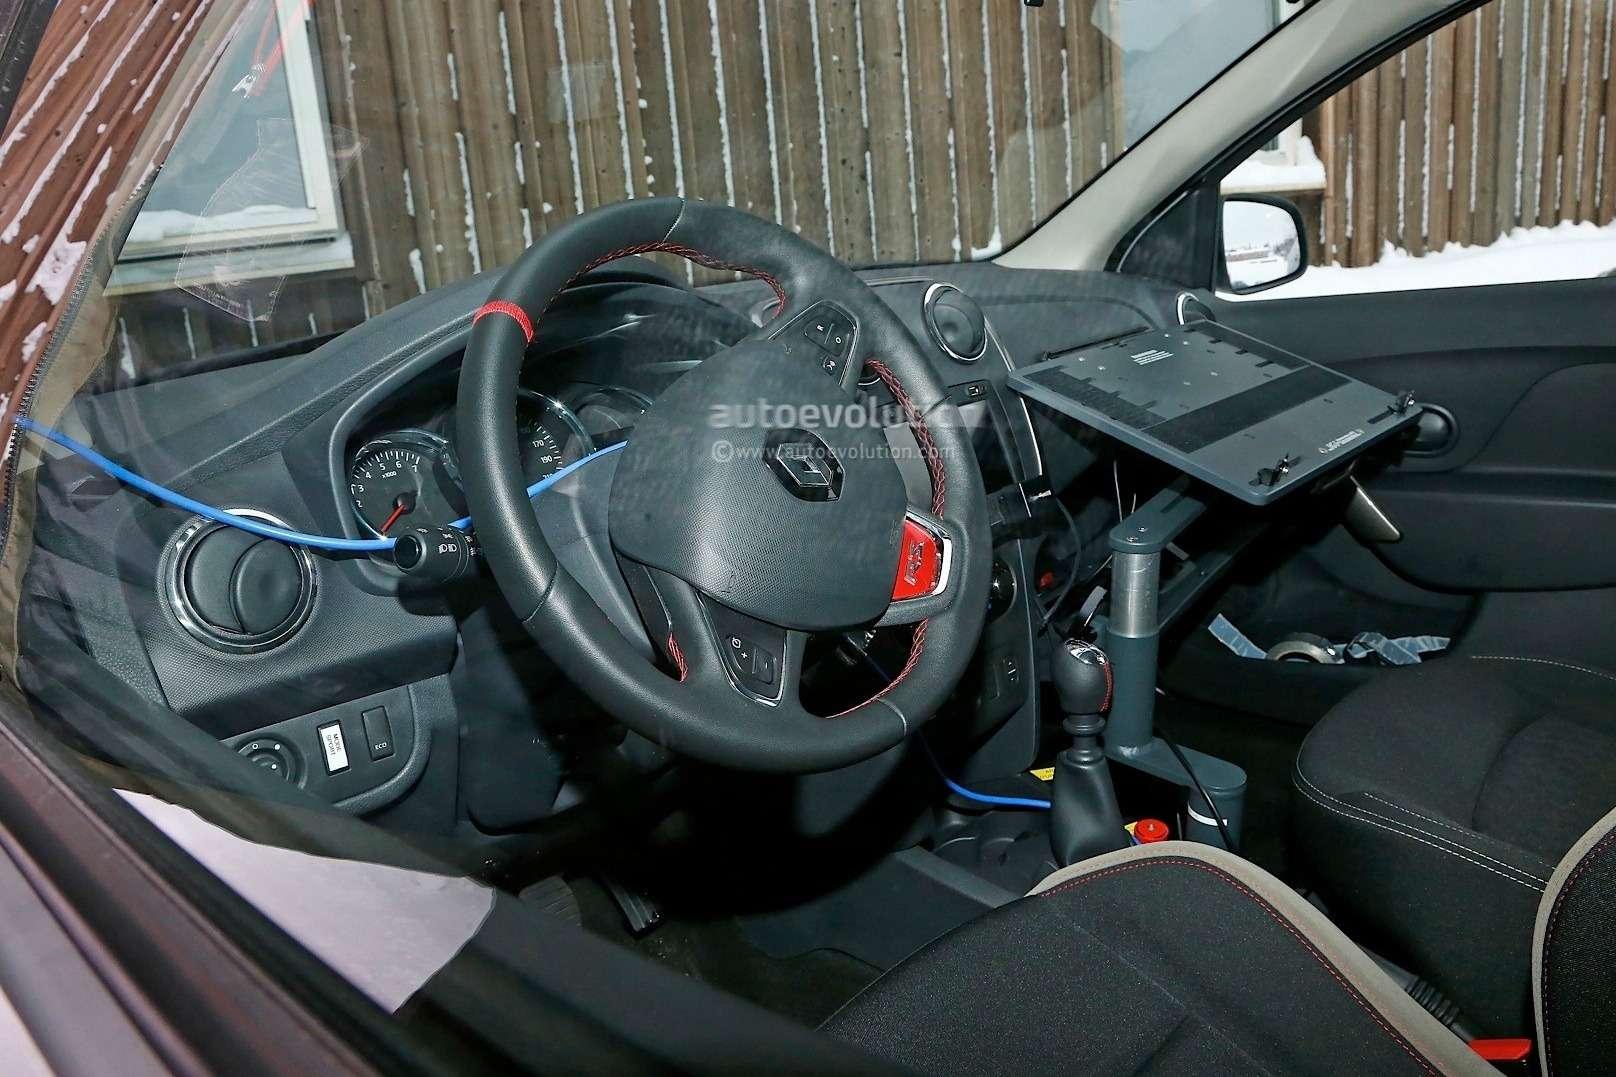 spyshots-dacia-sandero-rs-getting-12-turbo-engine-sportier-interior_9